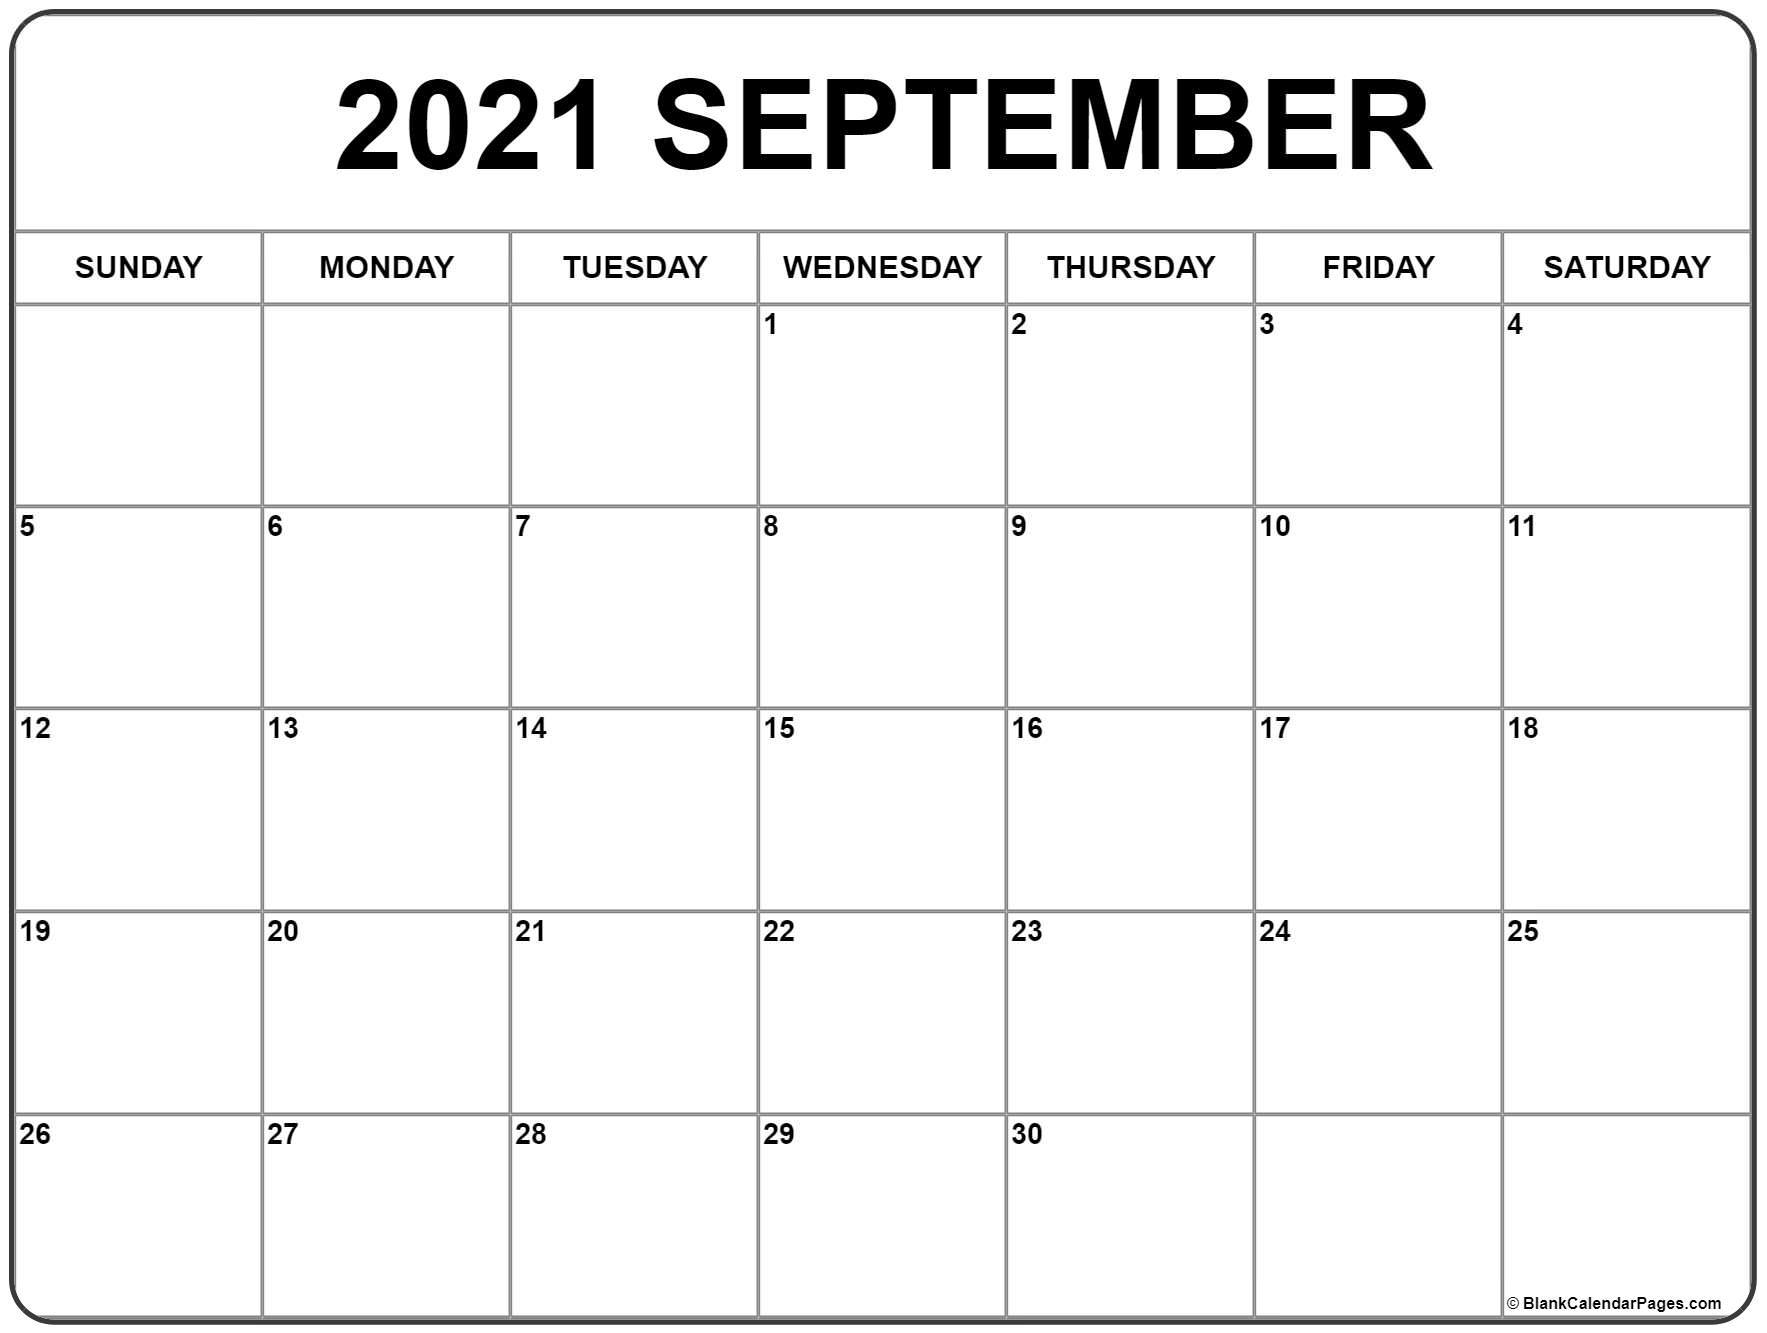 Get September Calendar 2021 Printable Free Pretty